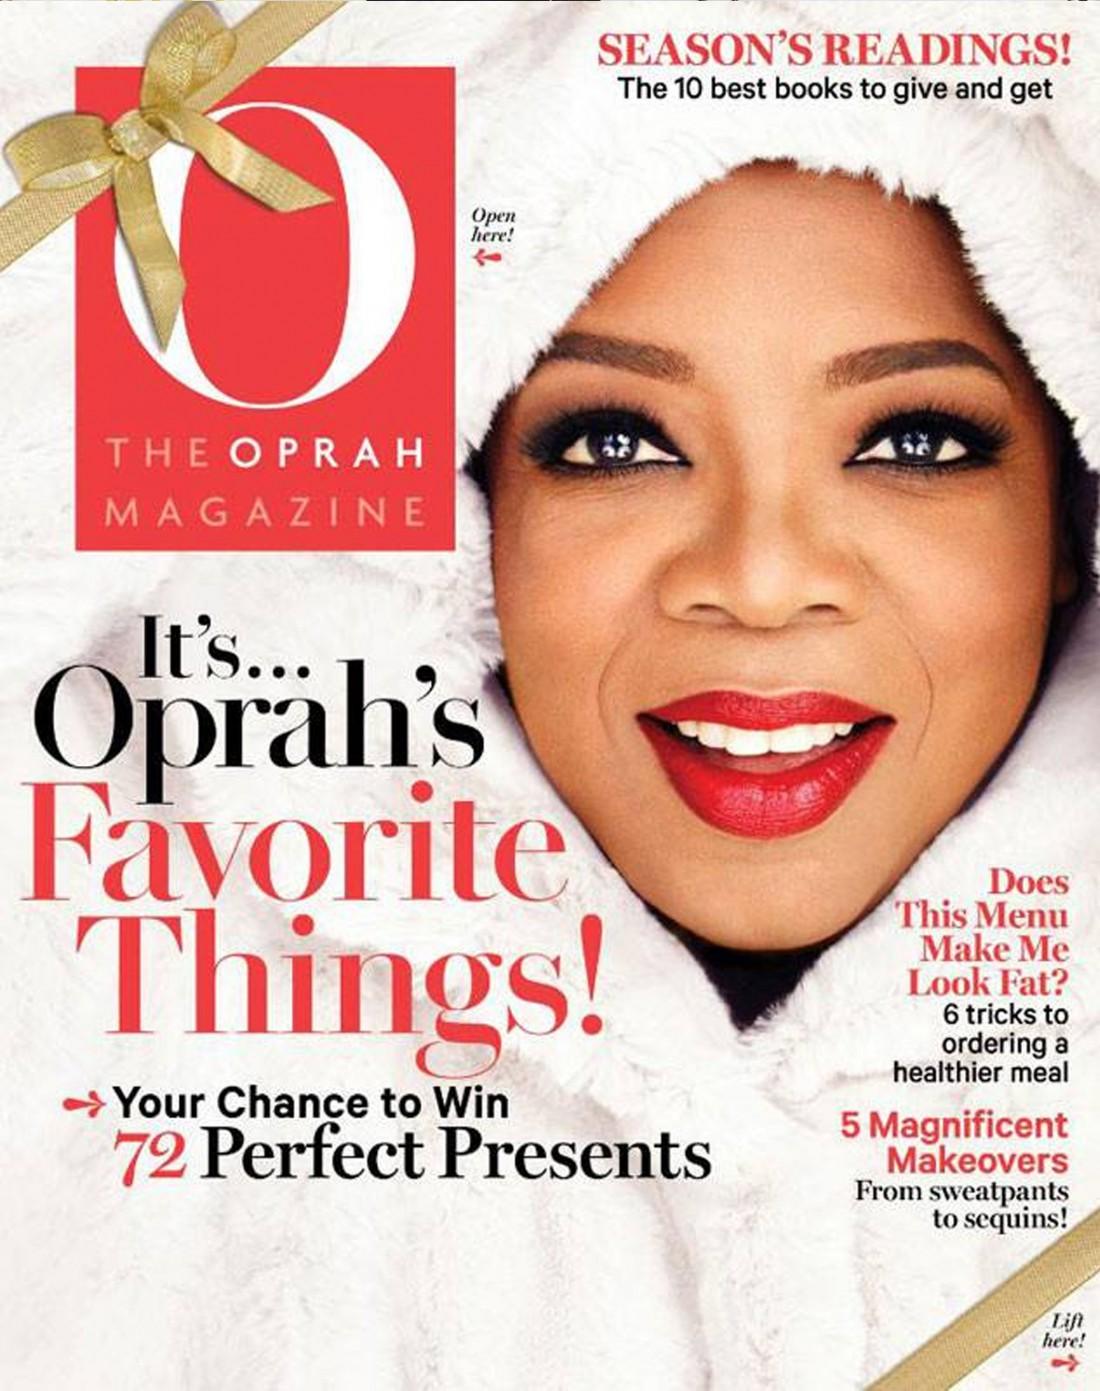 Опра отметила угги в Oprah's Favorite Things